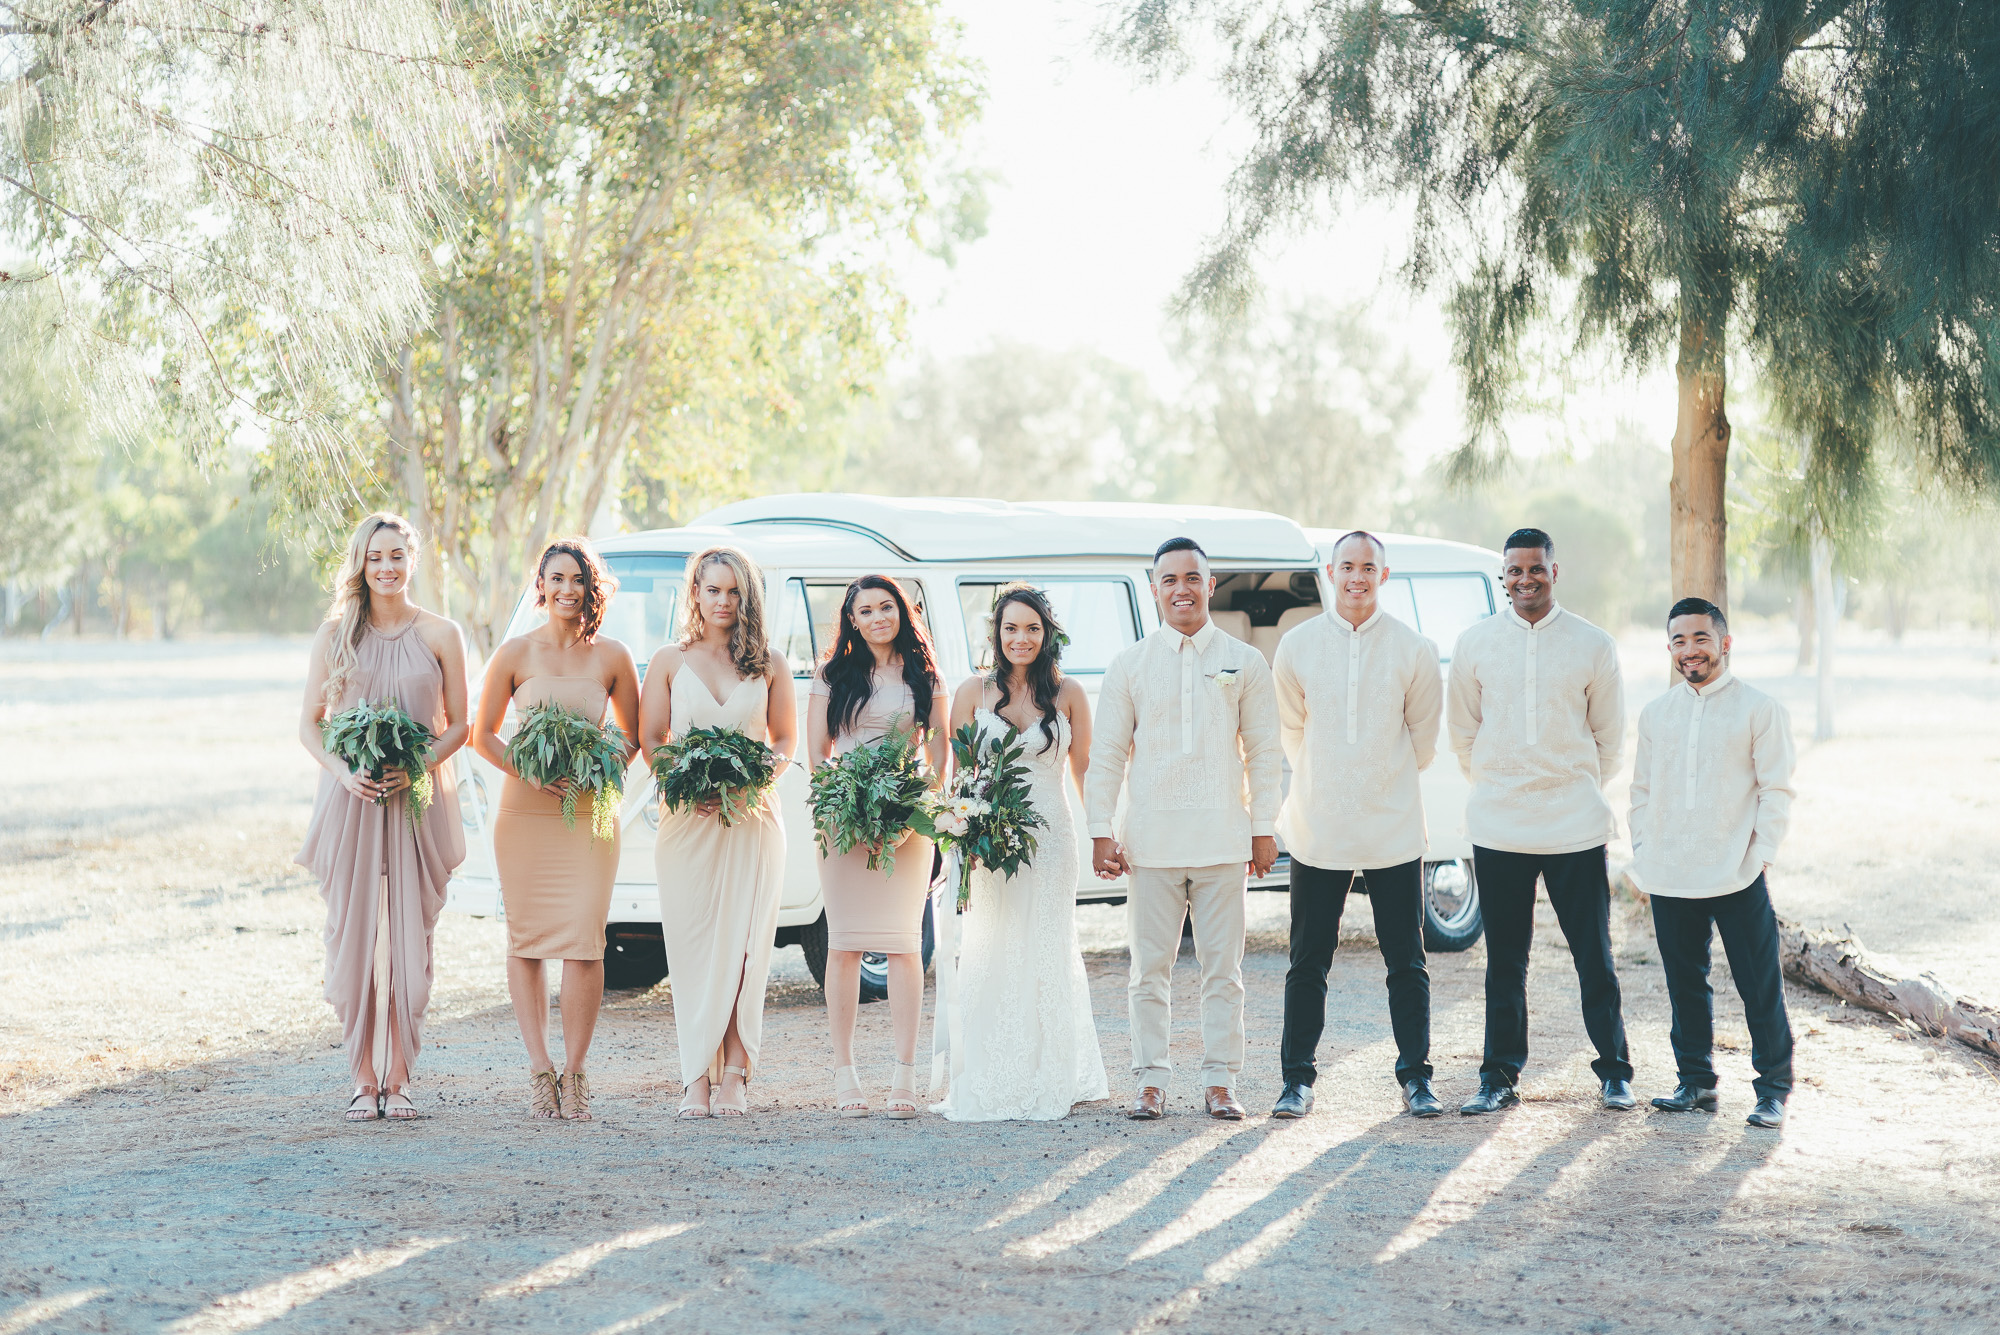 wedding-photographer-outdoor-casual-styled-los-angeles-australia-california-international-earthbound -55.jpg